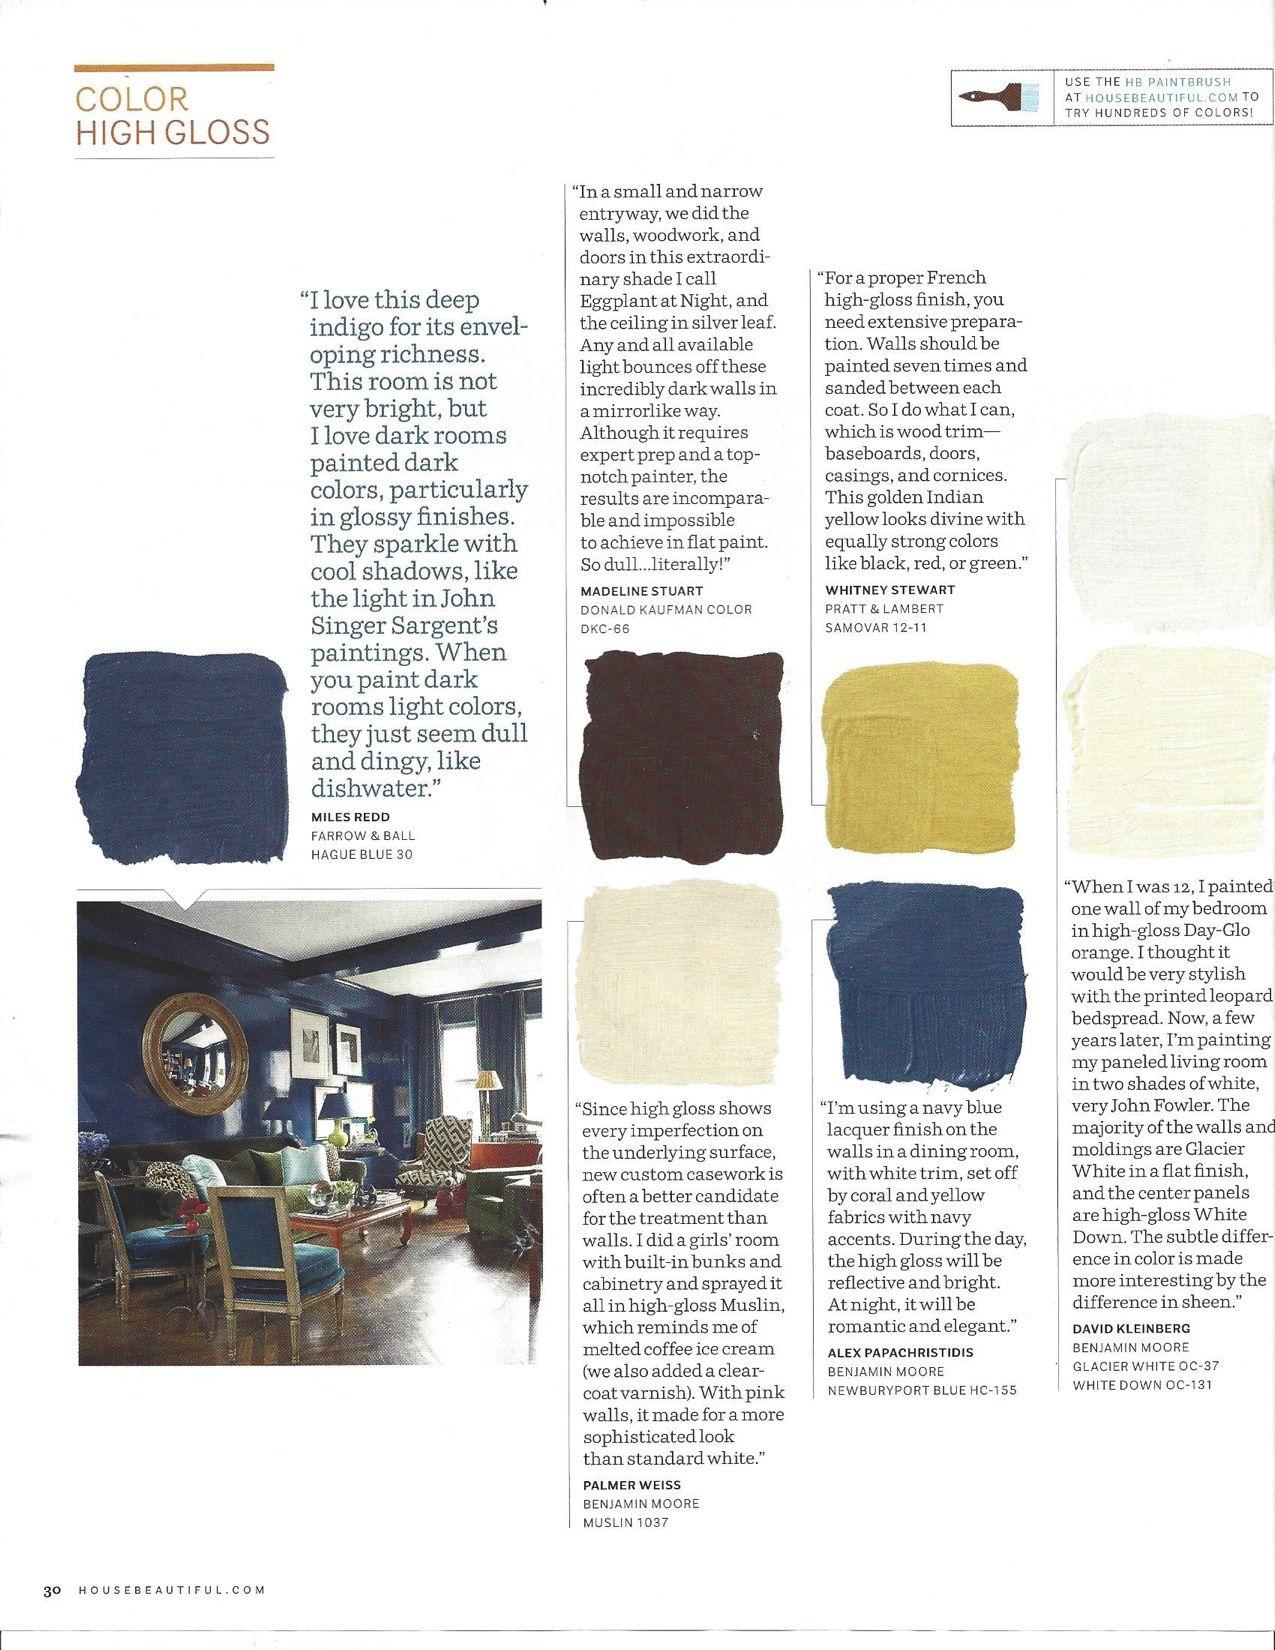 High Gloss High Gloss Room Paint Color